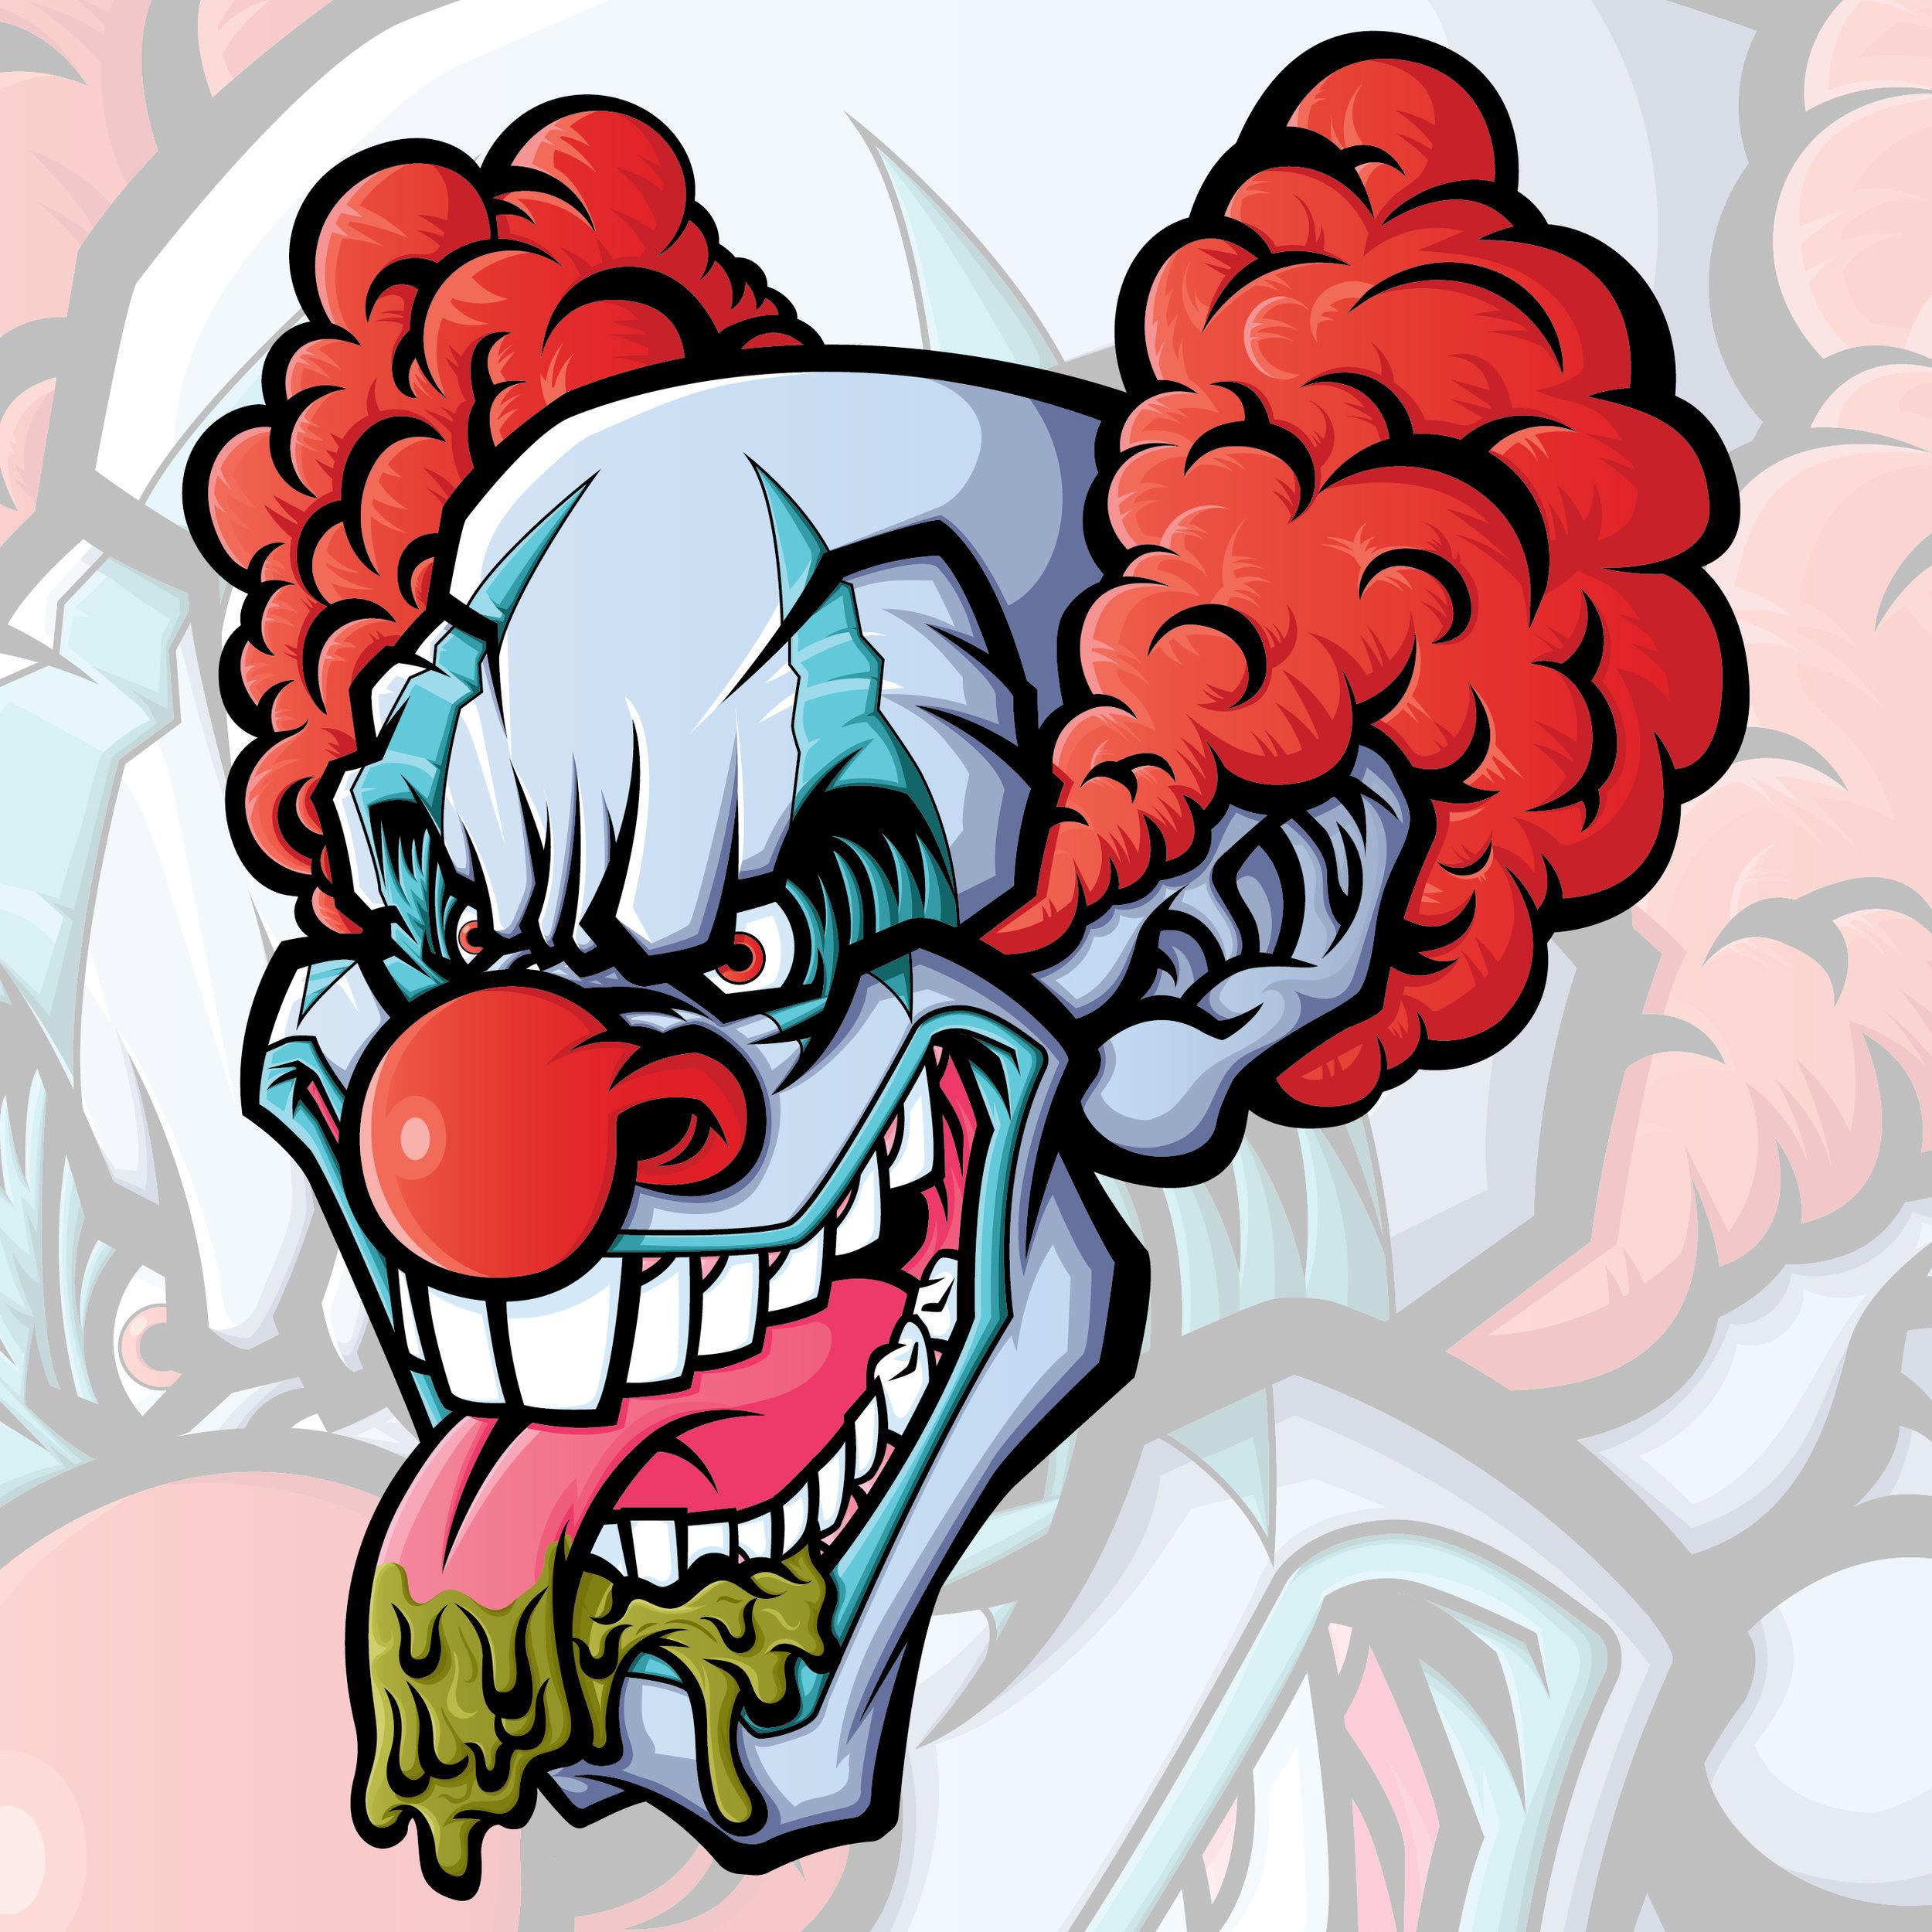 pukie-clown-reebok-crossfit-creepy-clowns-orozco-design-roberto-artist-vector-digitalart-wacom-intuos.jpg